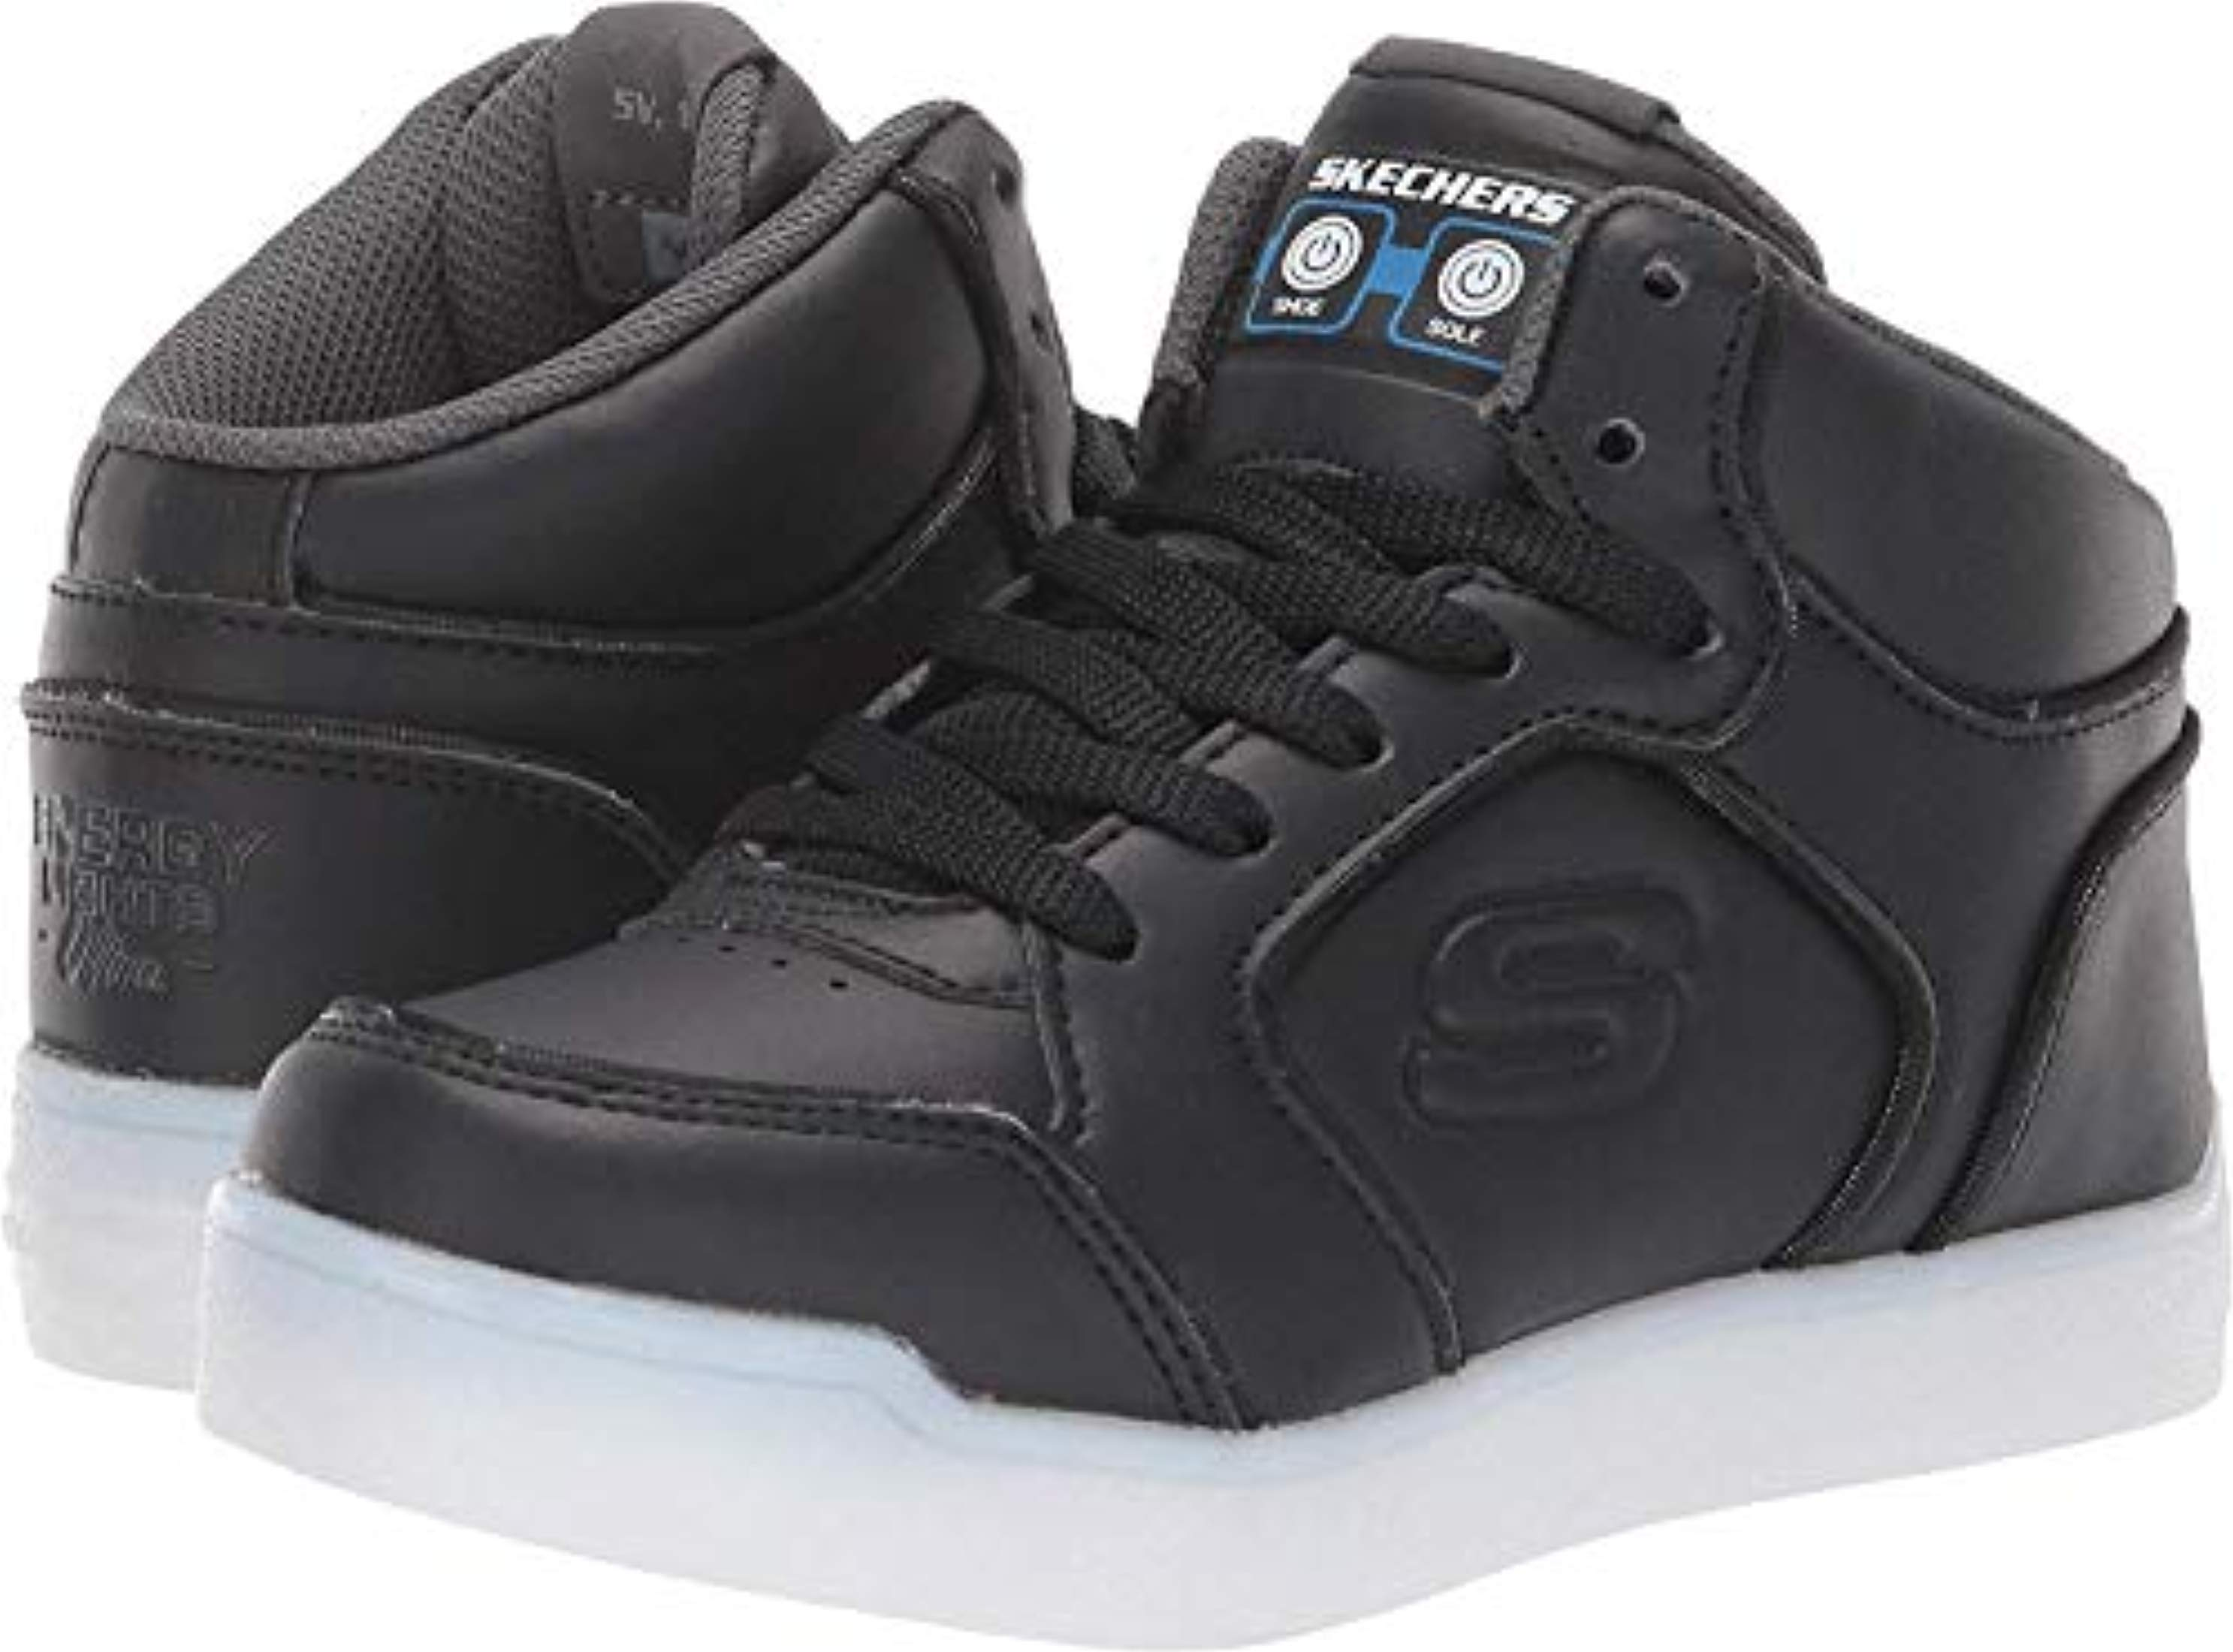 Skechers Skechers S Lights Energy Lights Ultra Kids Light Up Sneakers Black